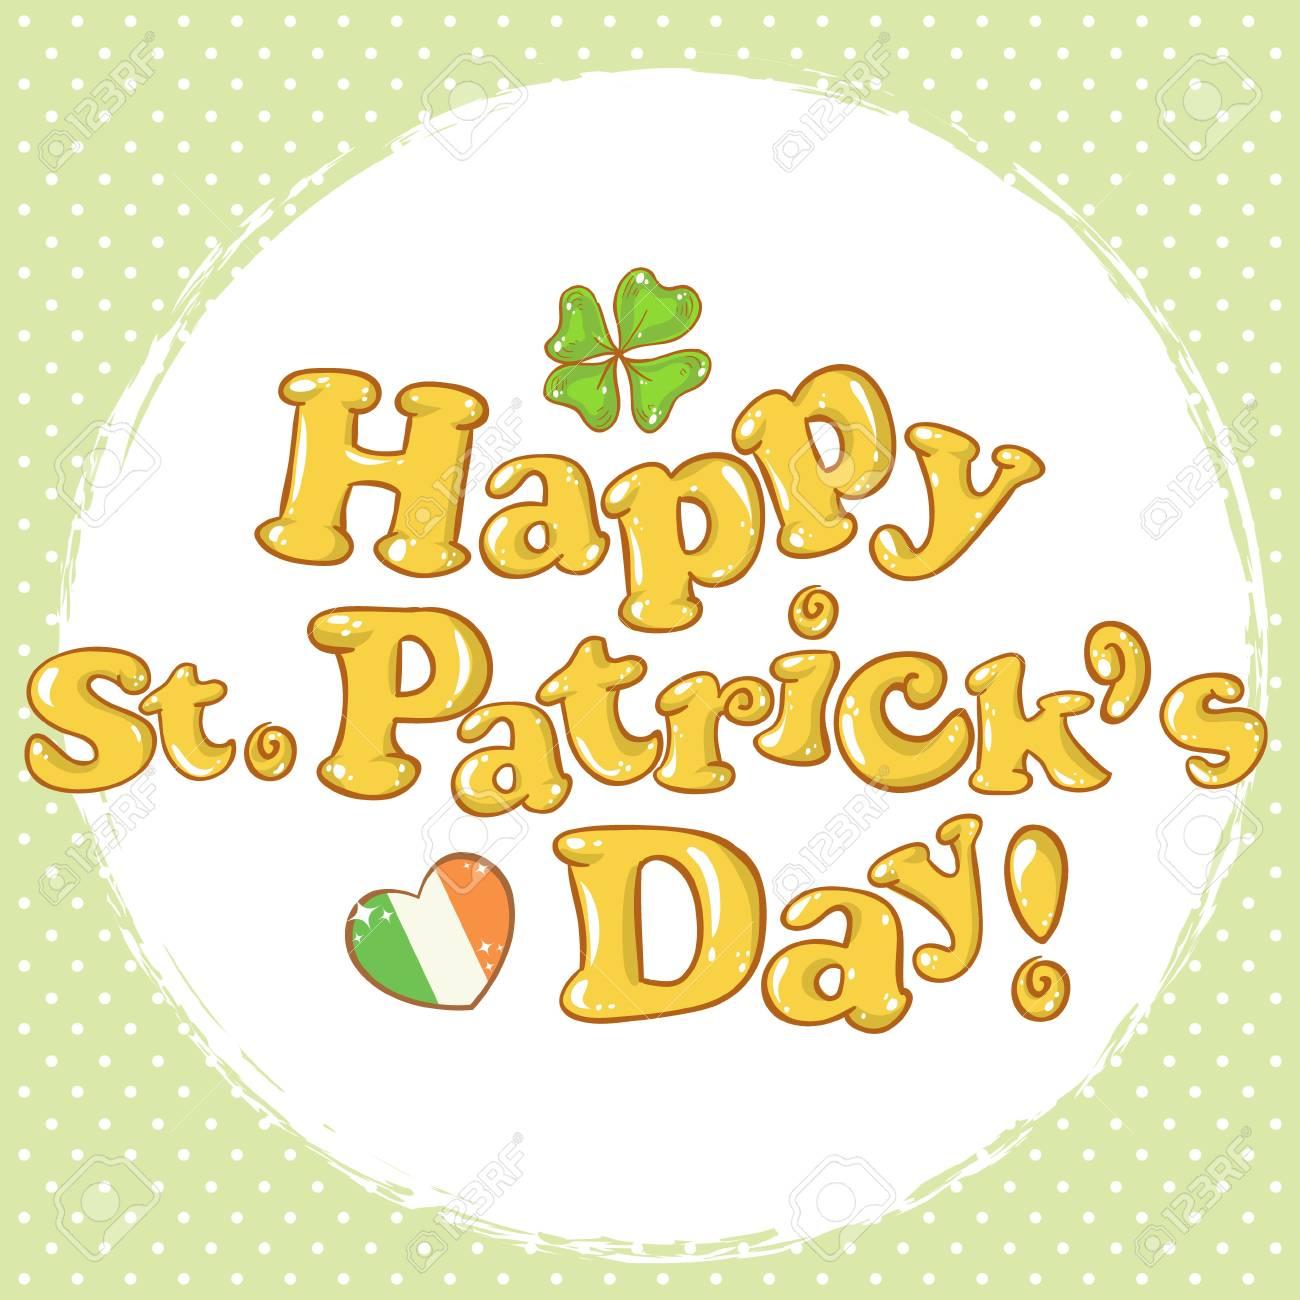 Saint Patrick Stock Vector - 17550705